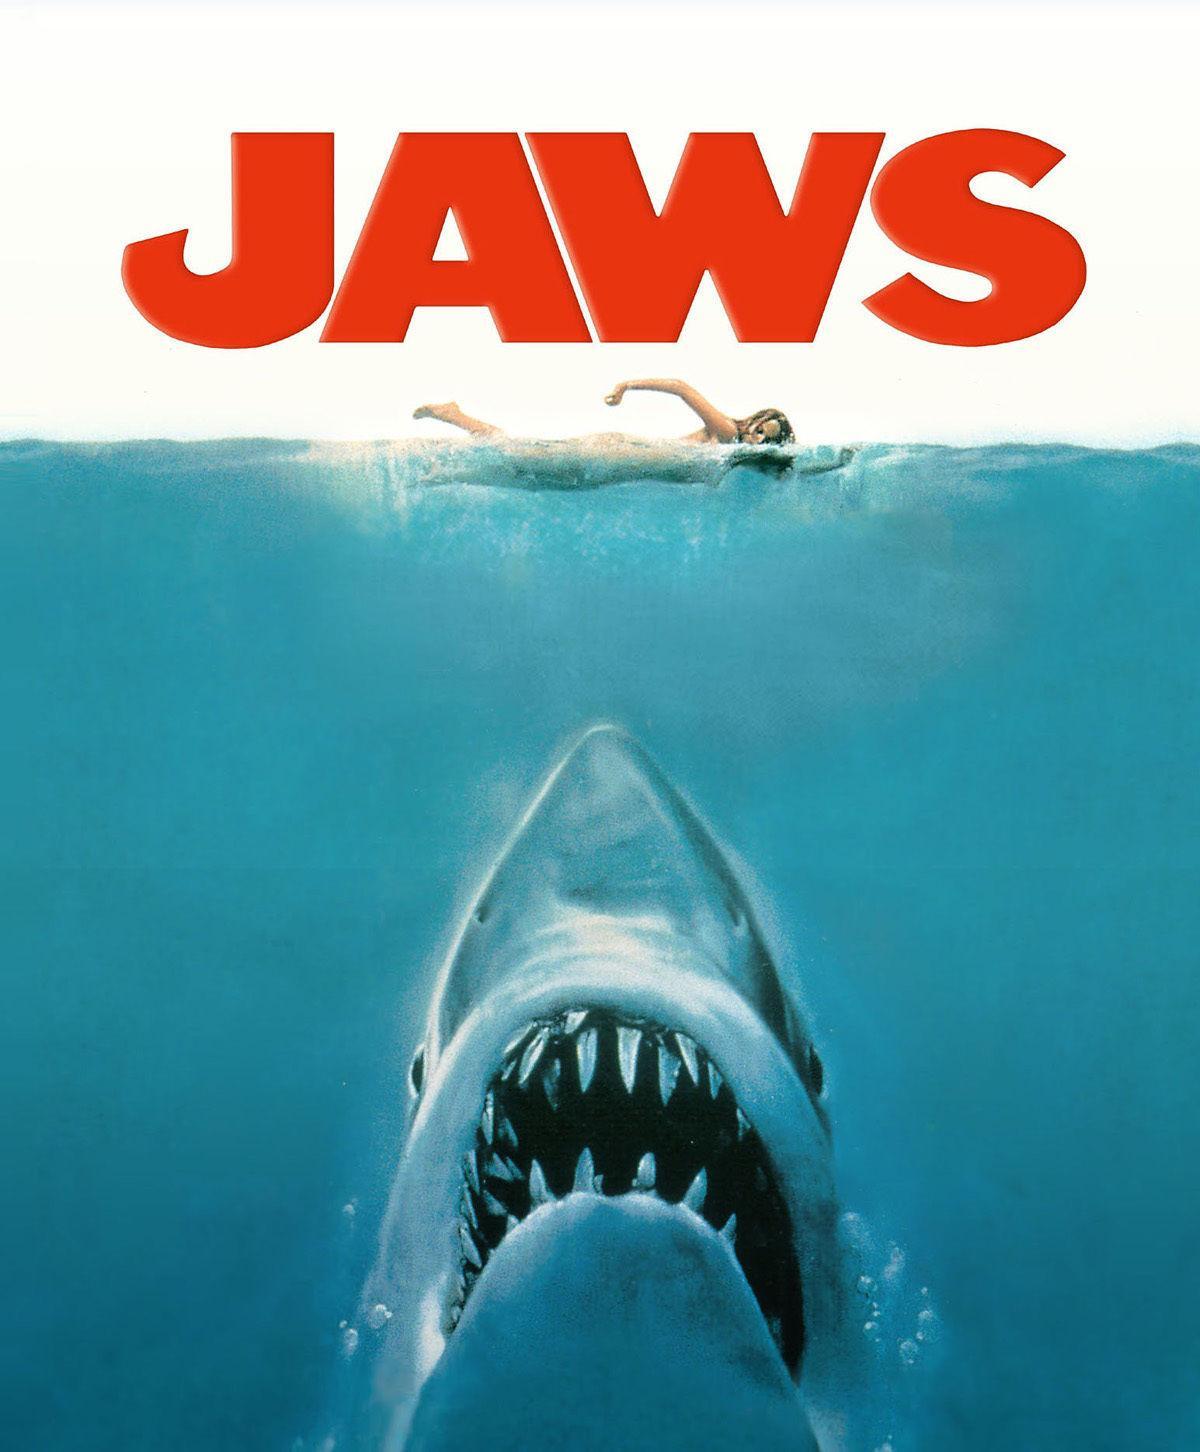 Remember when every week was 'Shark Week'?